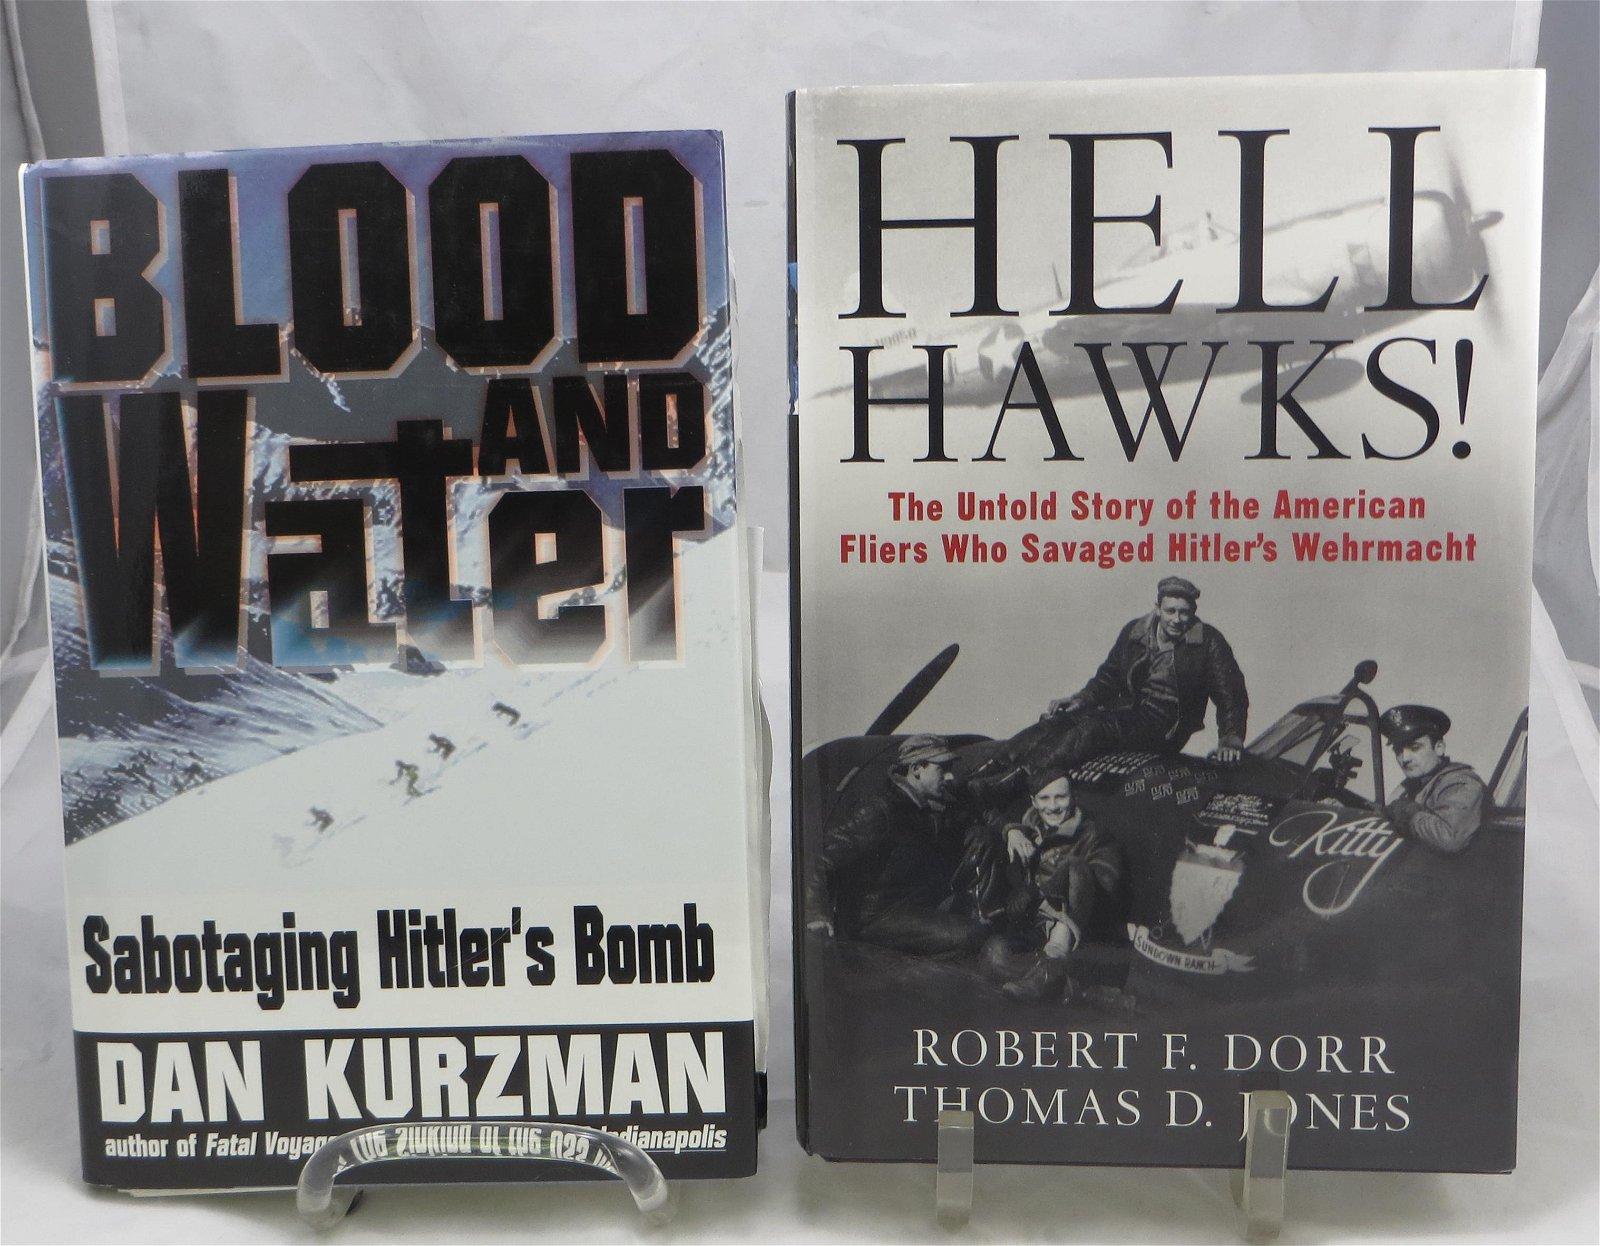 (2) SIGNED WW2 THEME BOOKS: DORR & JONES, KURZMAN